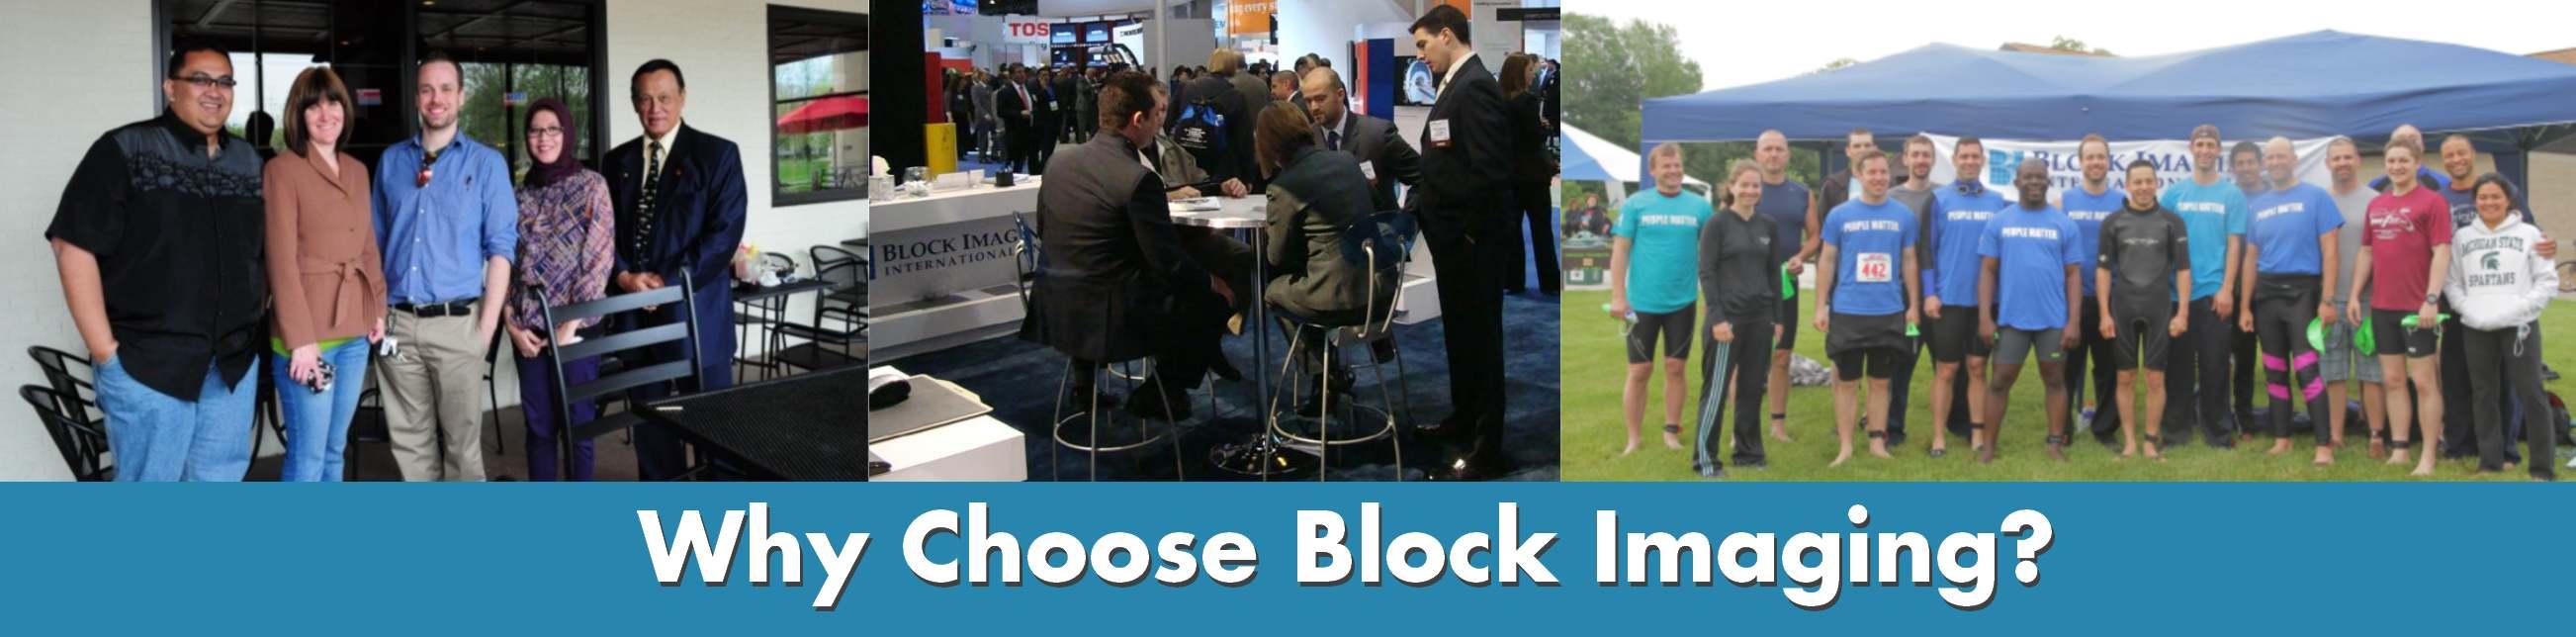 Why Choose Block